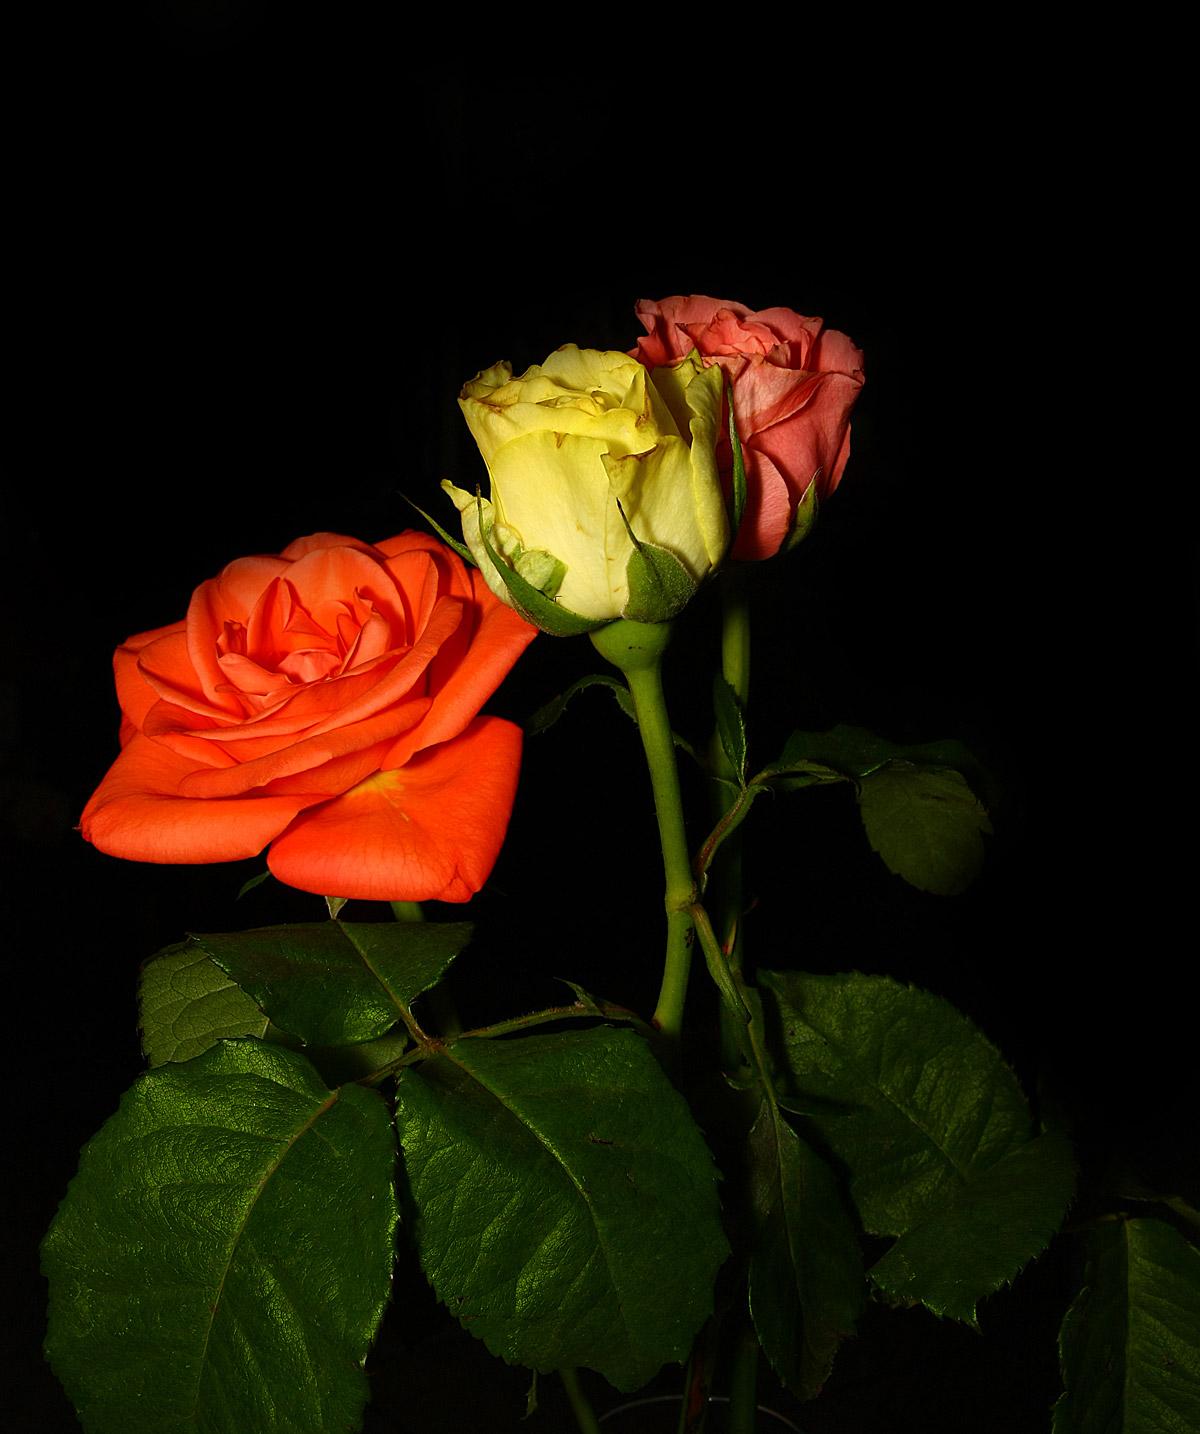 3 roses...